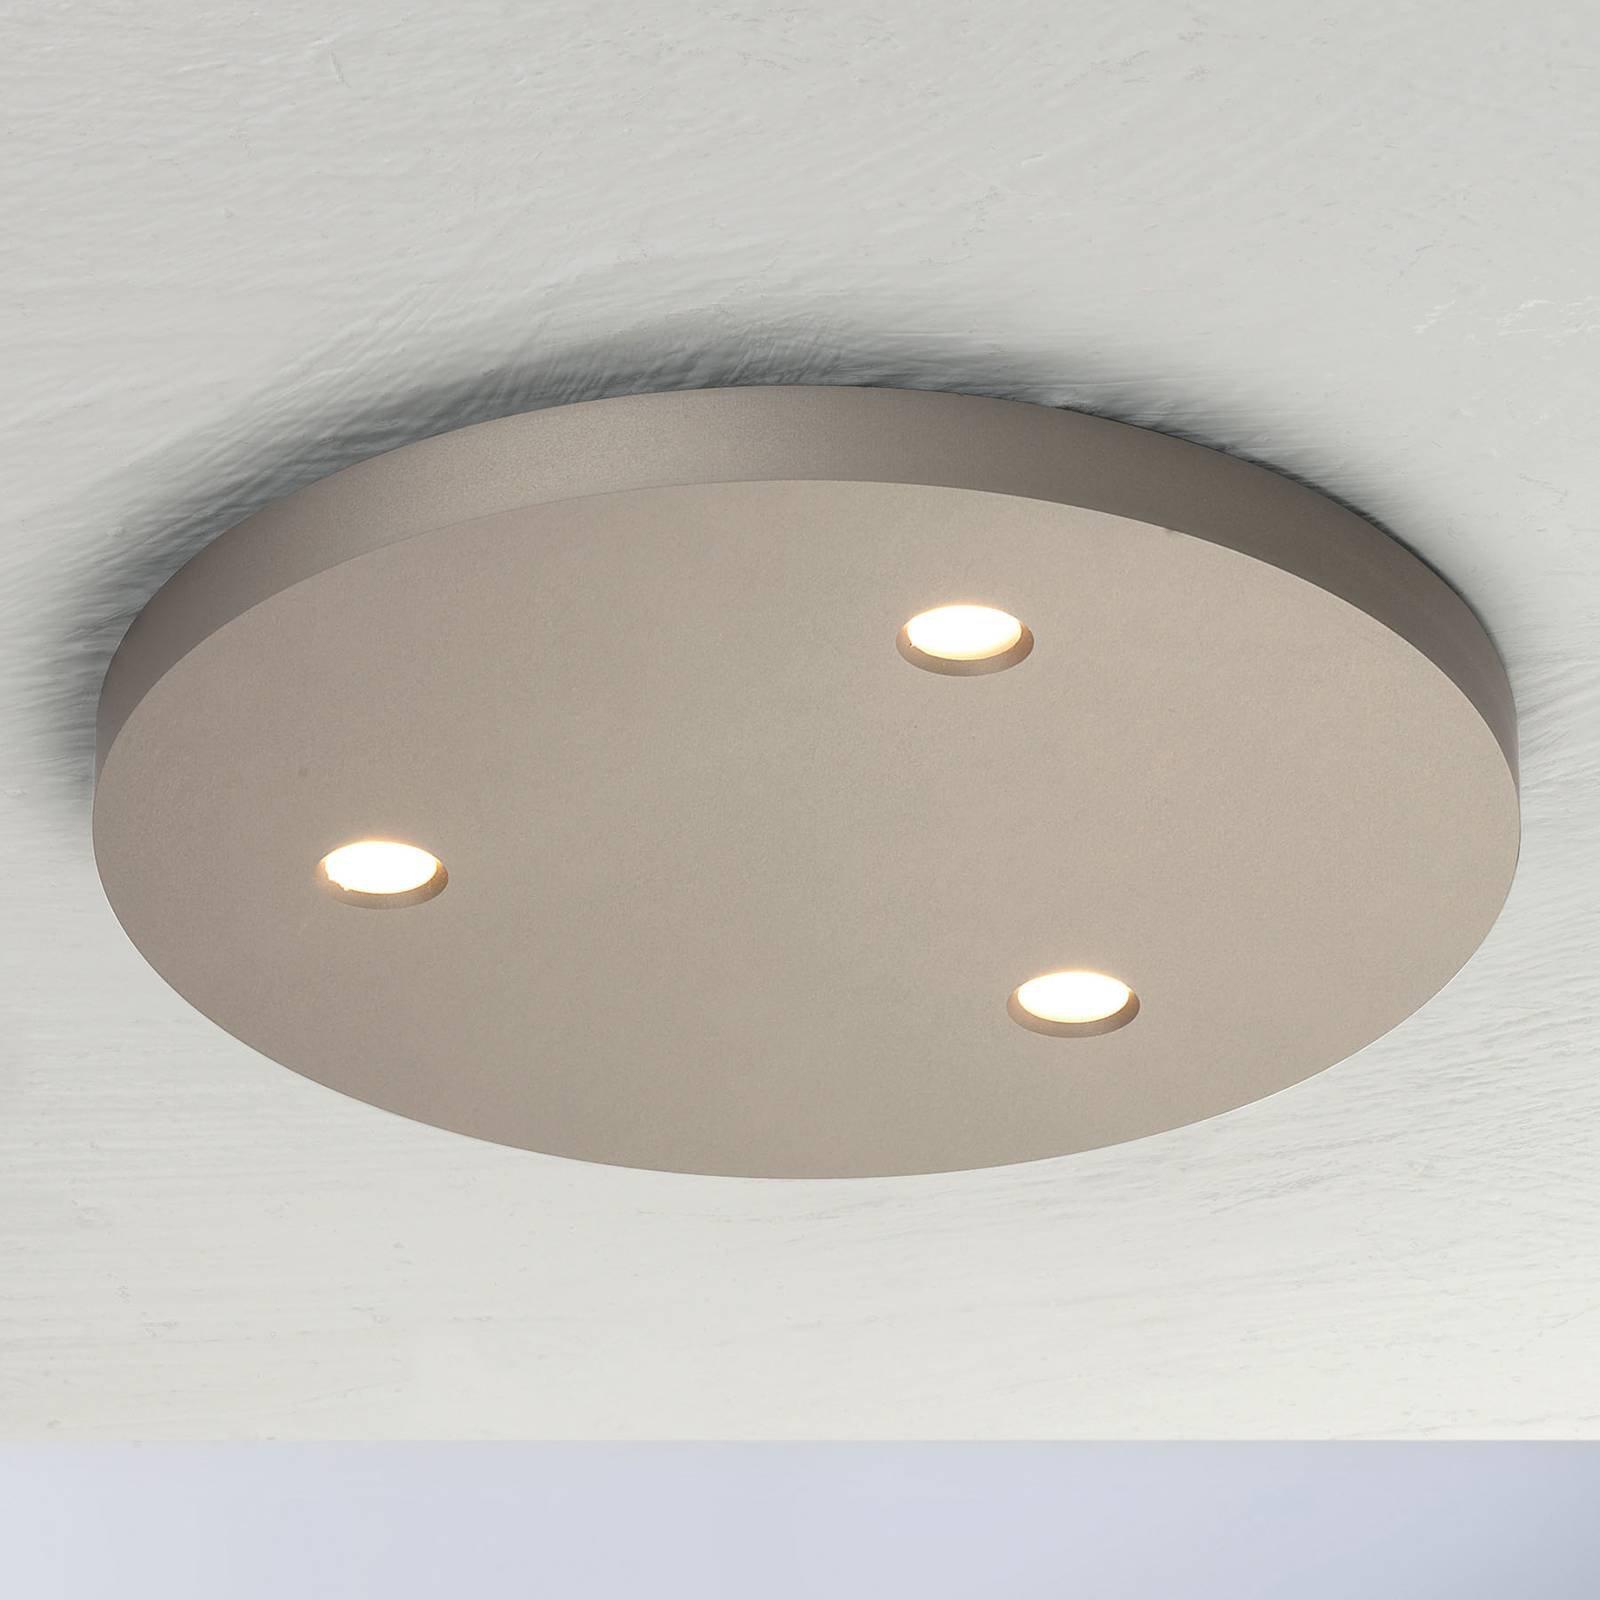 Bopp Close LED-taklampe, tre lyskilder, rund taupe